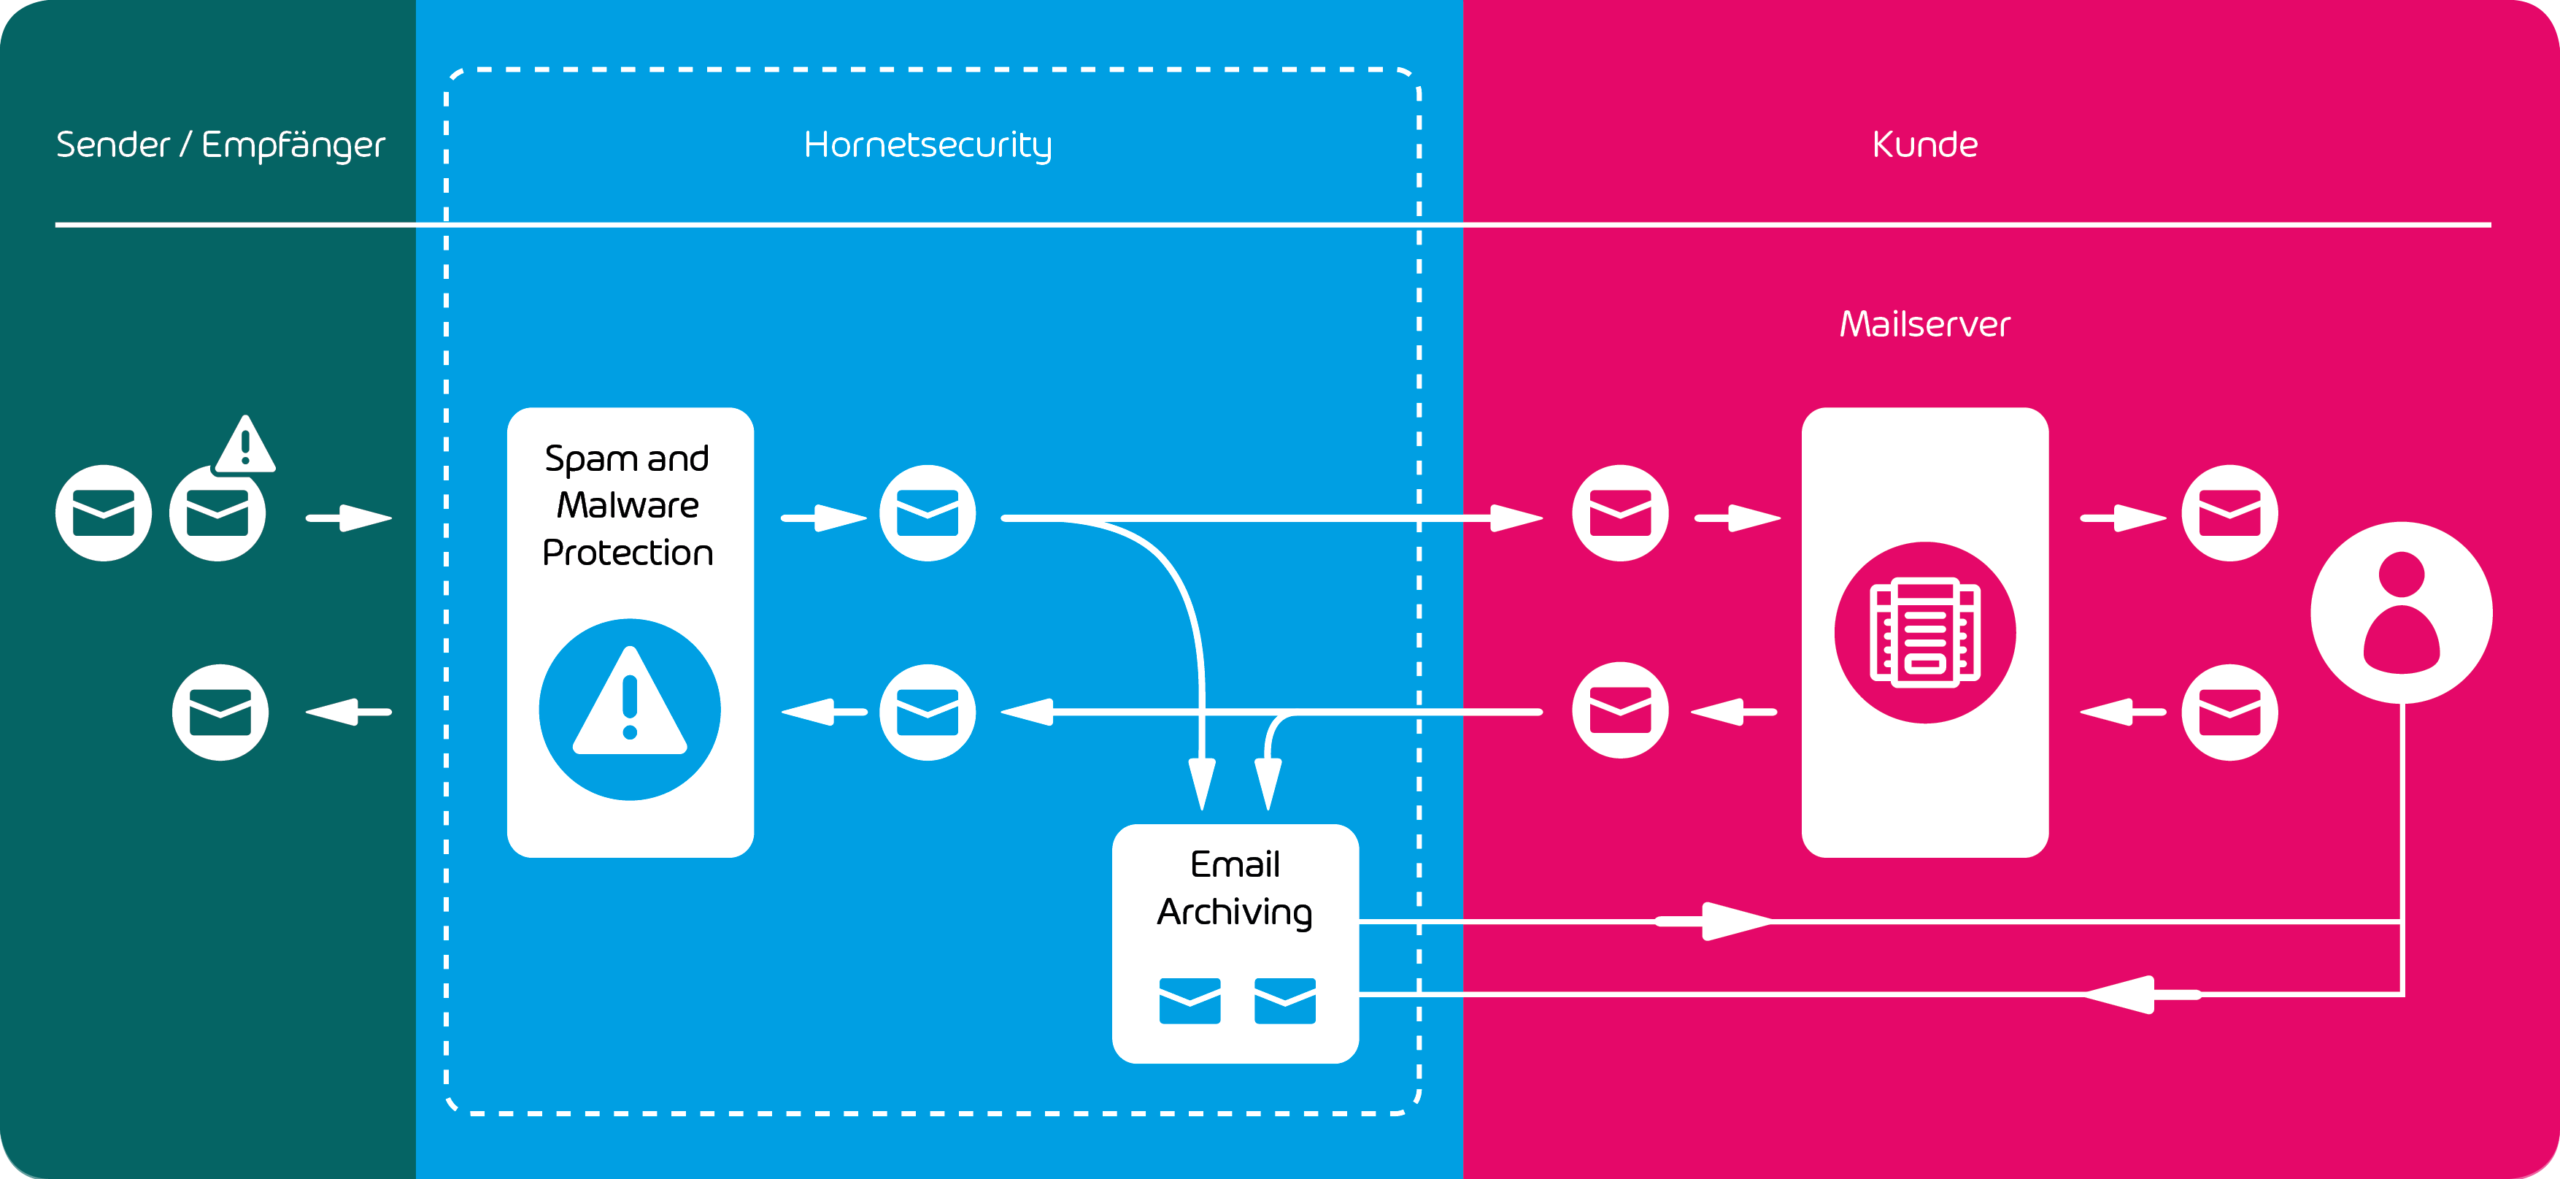 Grafik zur Integration von Email Archiving im E-Mail Management System